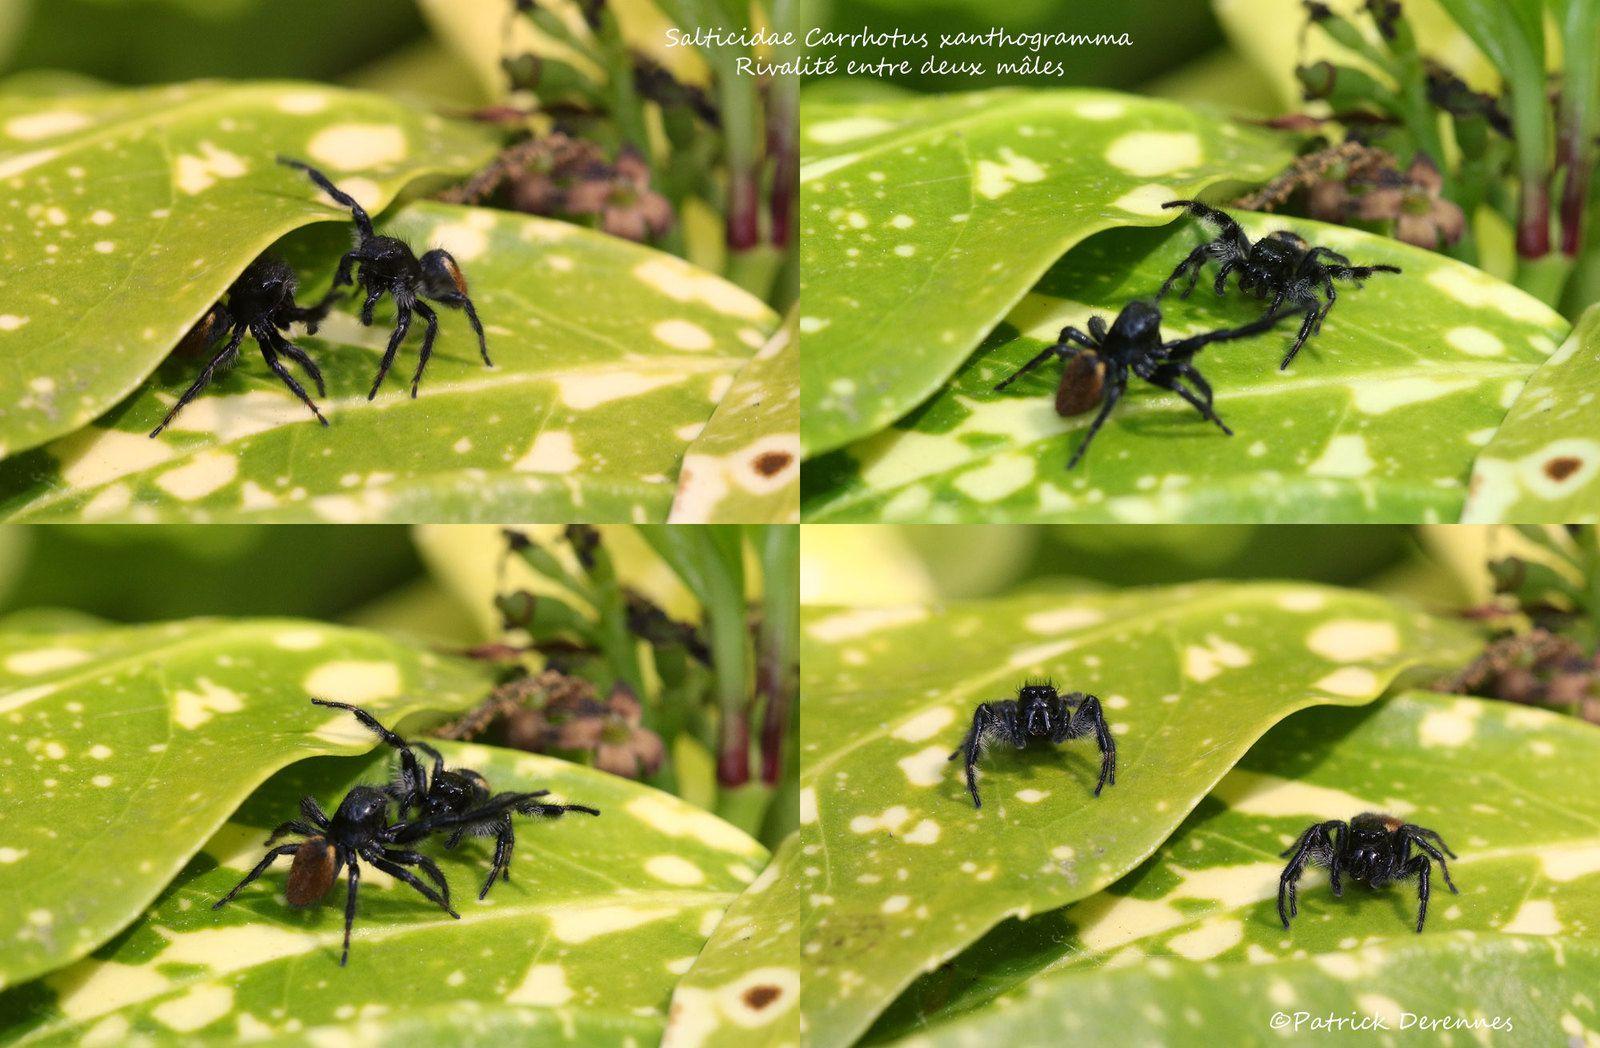 Carrhotus xanthogramma - intimidation entre deux mâles